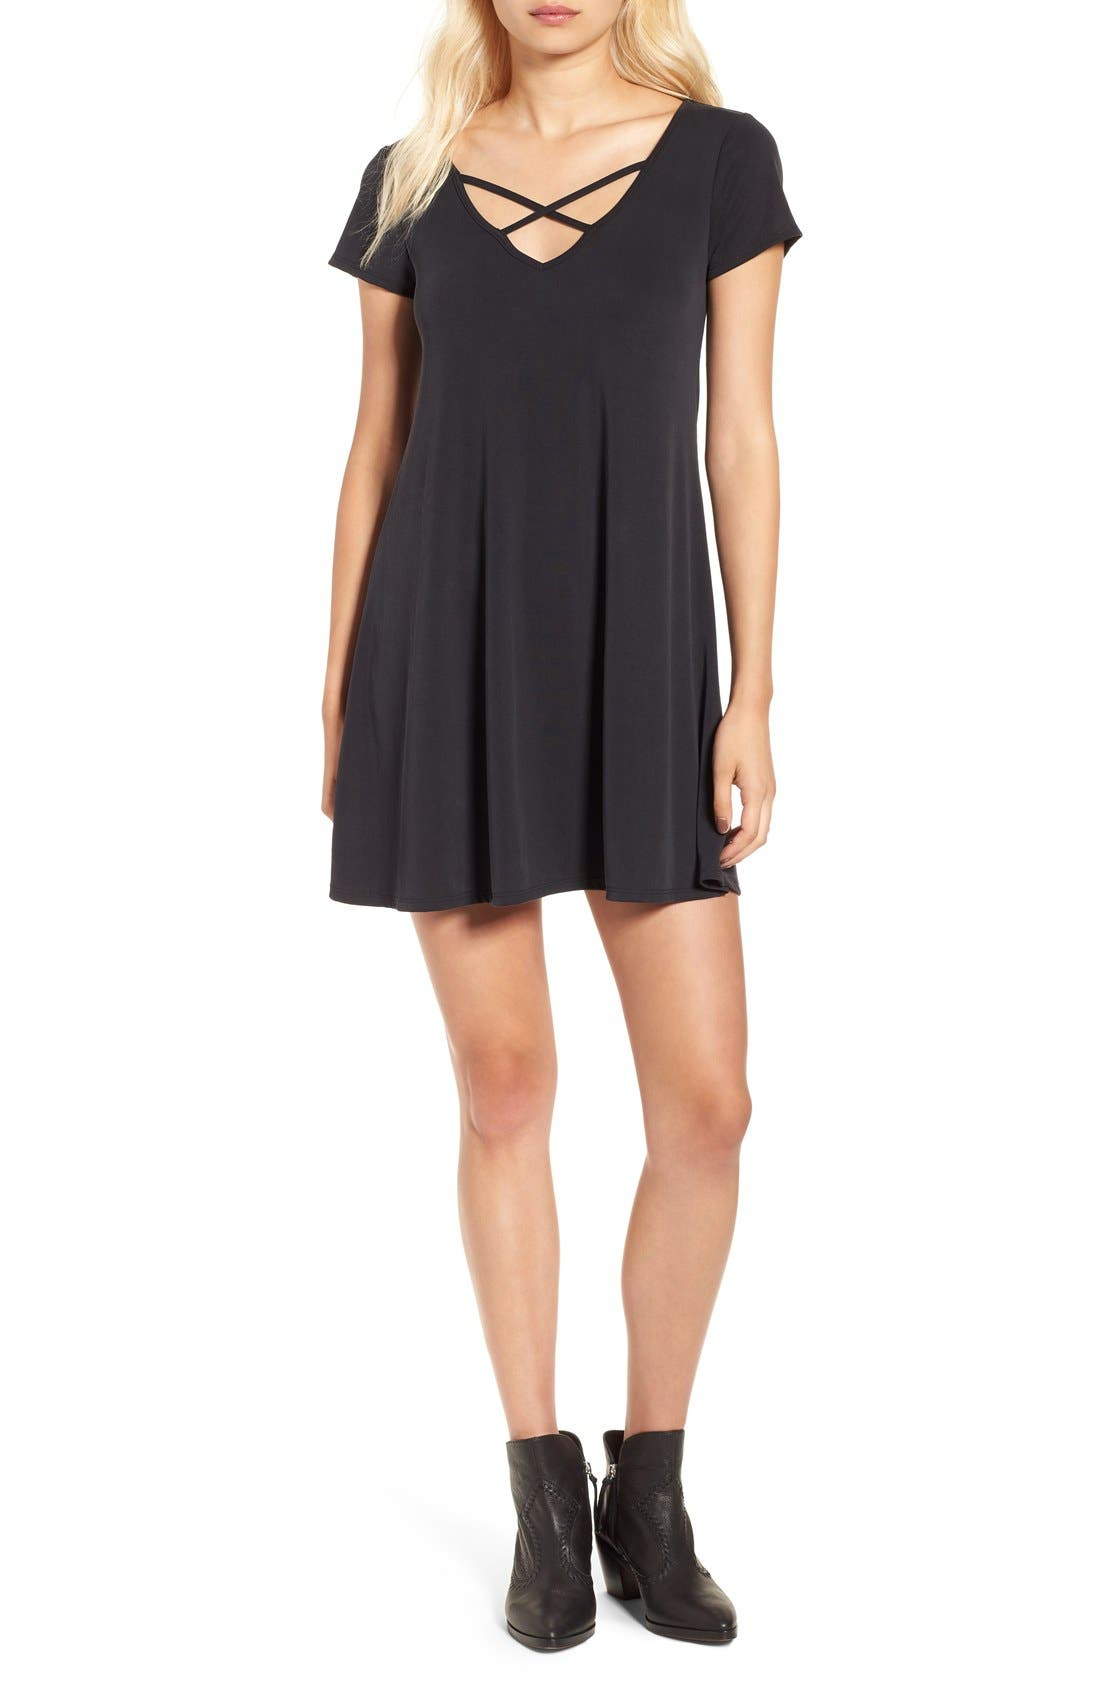 SOCIALITE Cross Front T-Shirt Dress, Main, color, 001